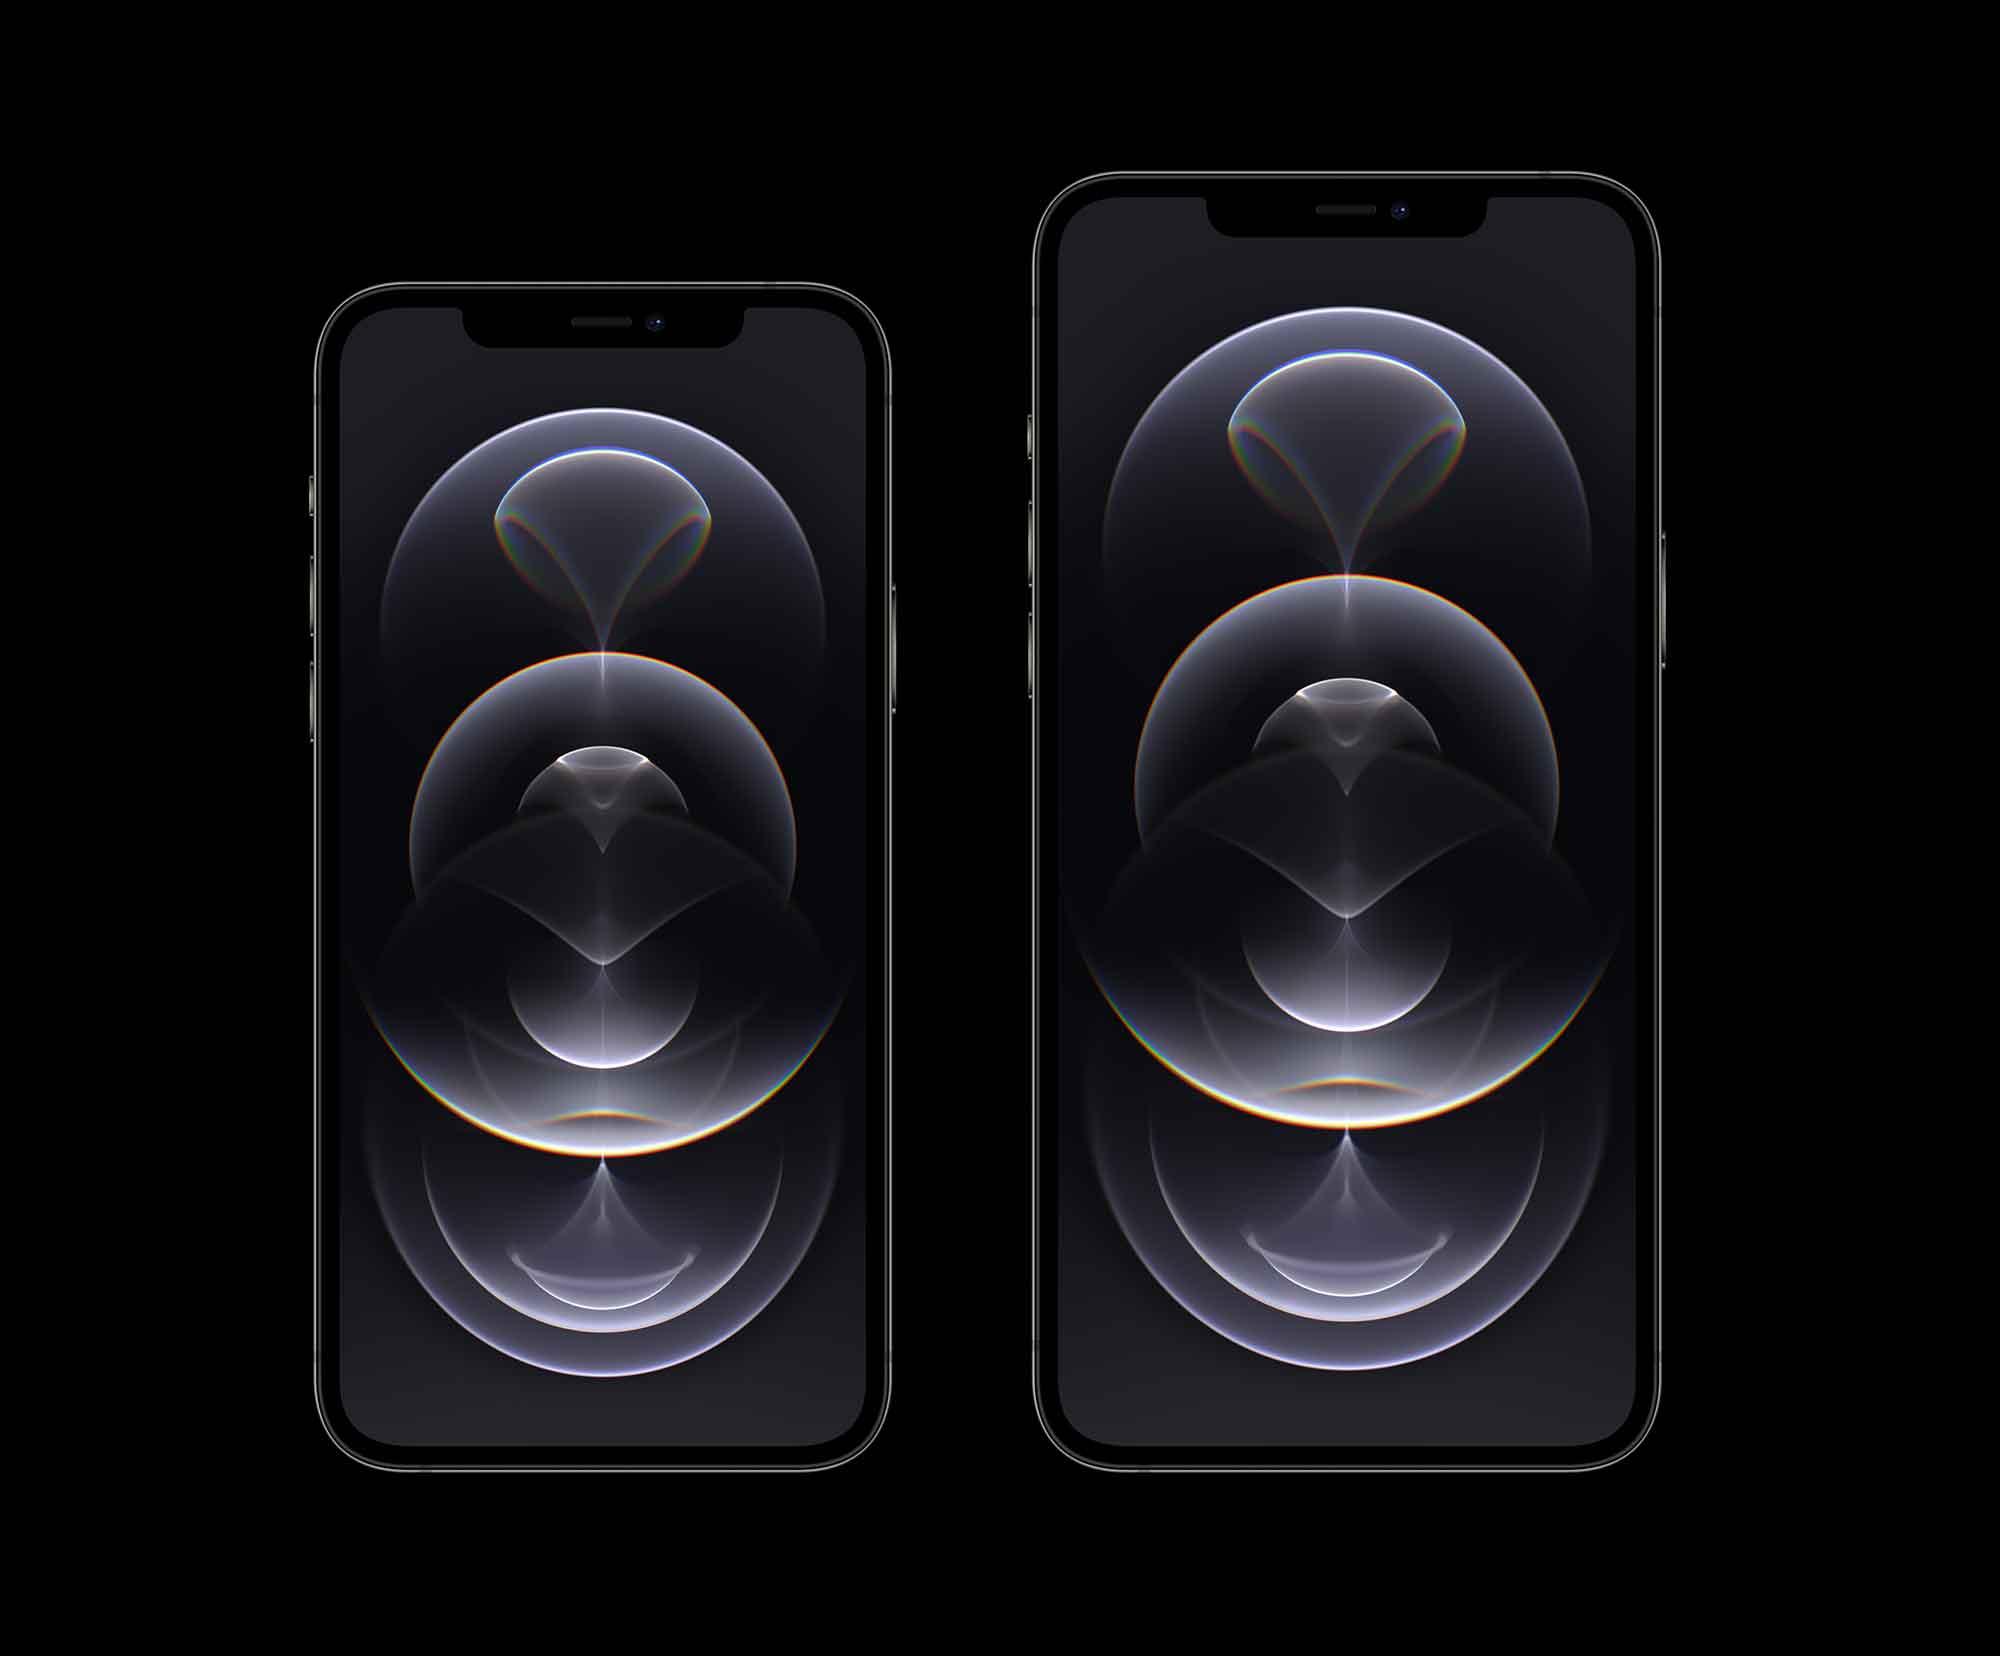 iPhone 12 Pro Mockup 2